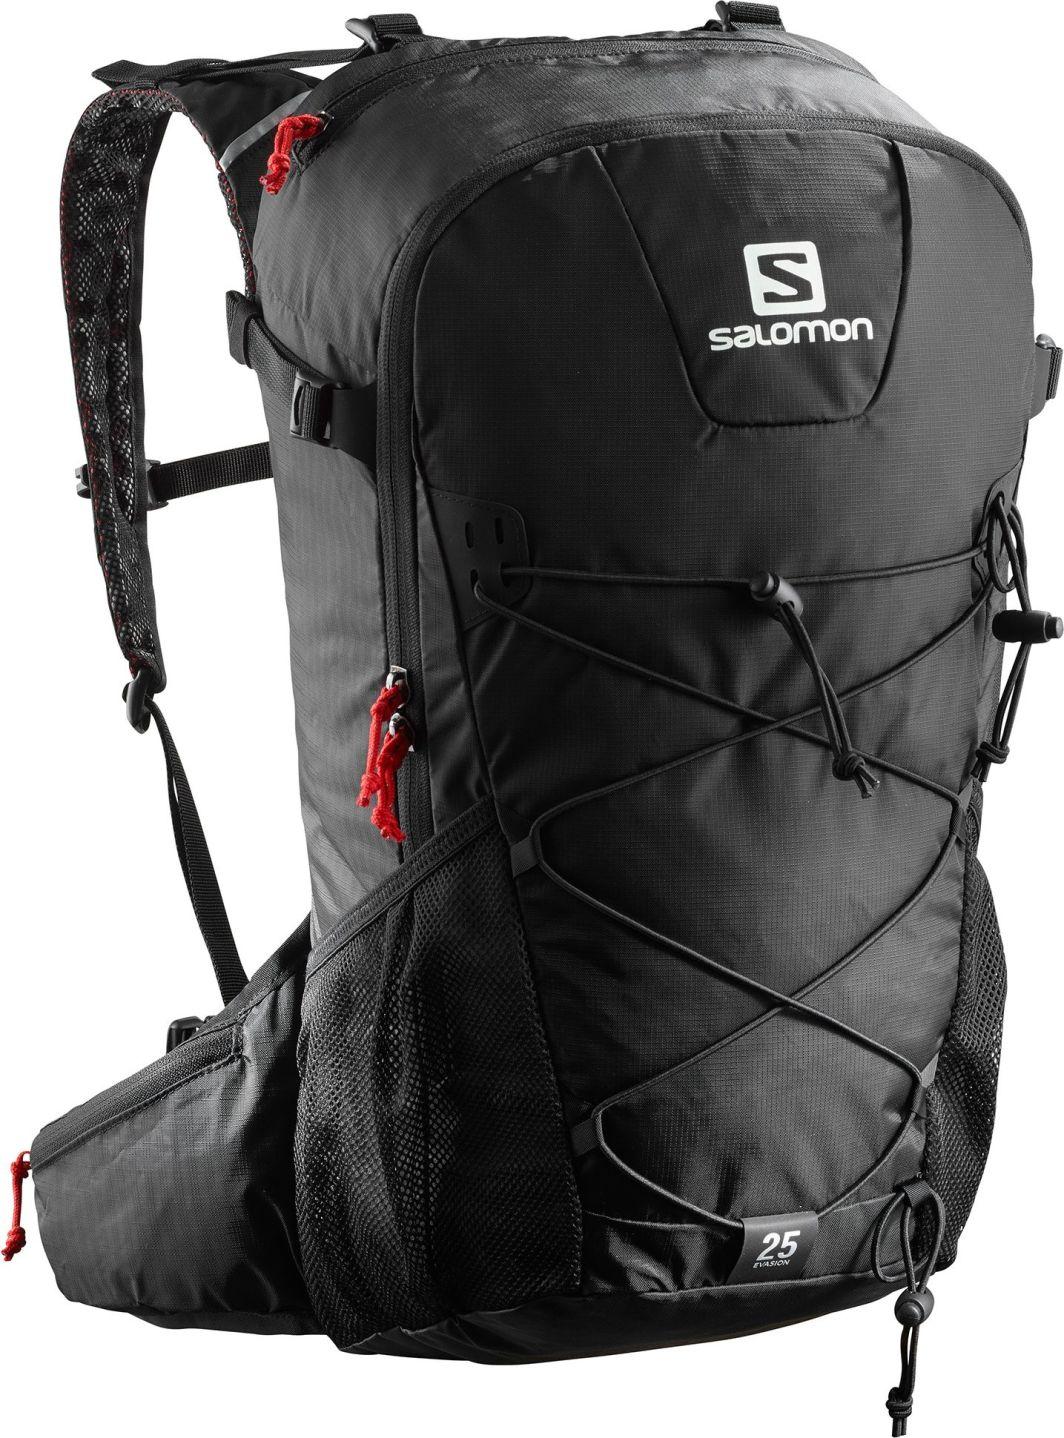 Salomon Plecak trekkingowy Evasion 25 Black (401627) ID produktu: 4691910